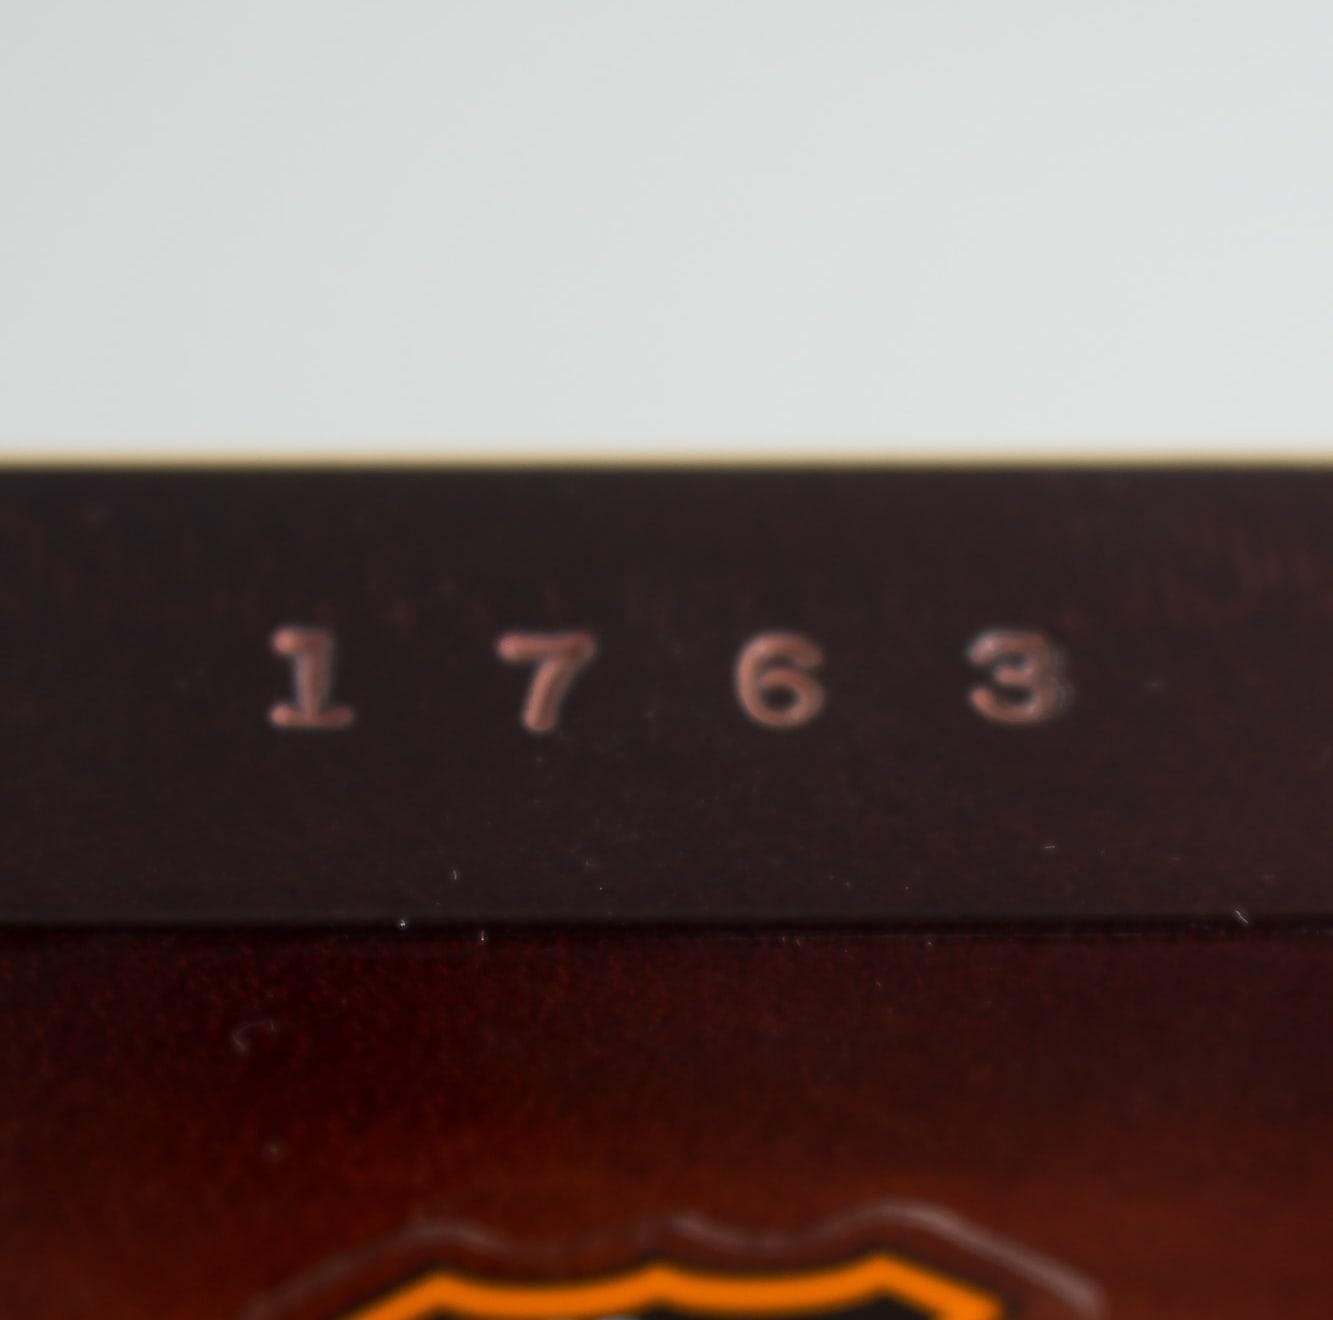 National  Style 0 Deluxe Resophonic Guitar (2004), ser. #1763-2, original black tolex hard shell case.